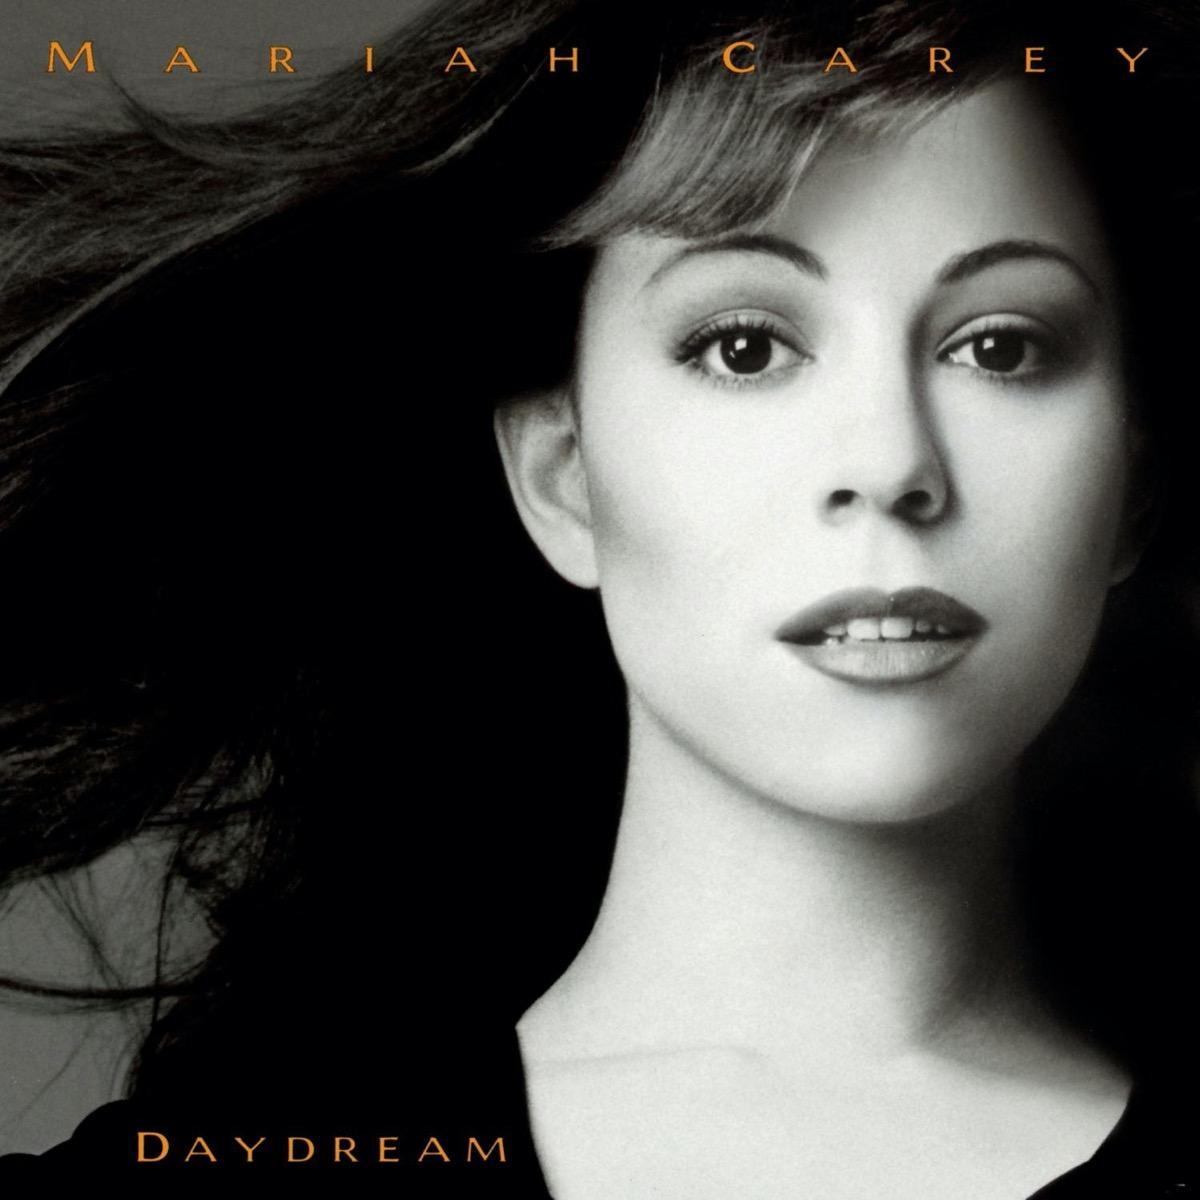 Mariah Carey Daydream album cover